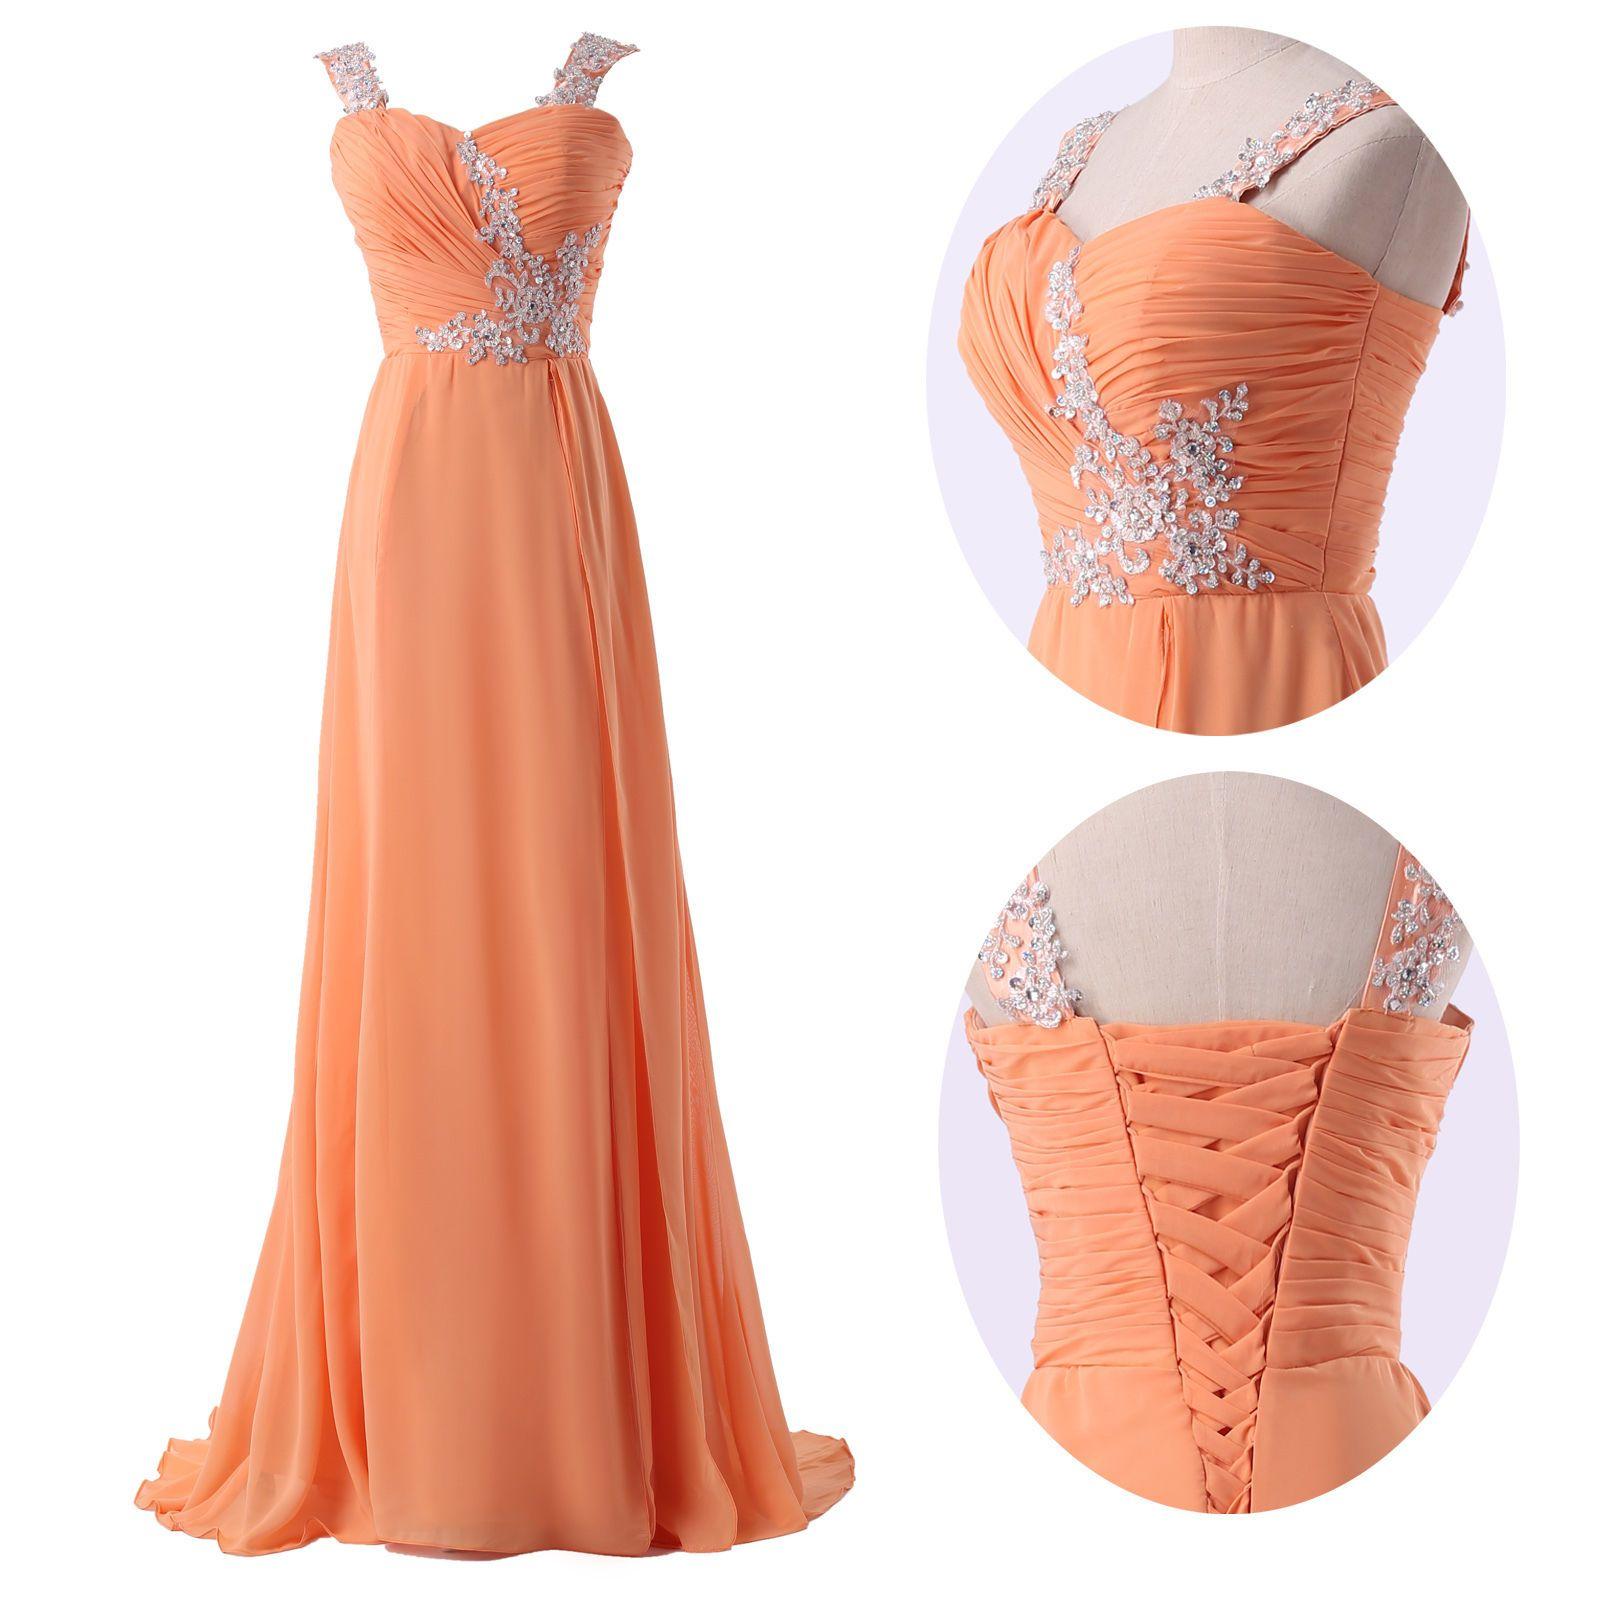 ebay.co.uk prom dresses